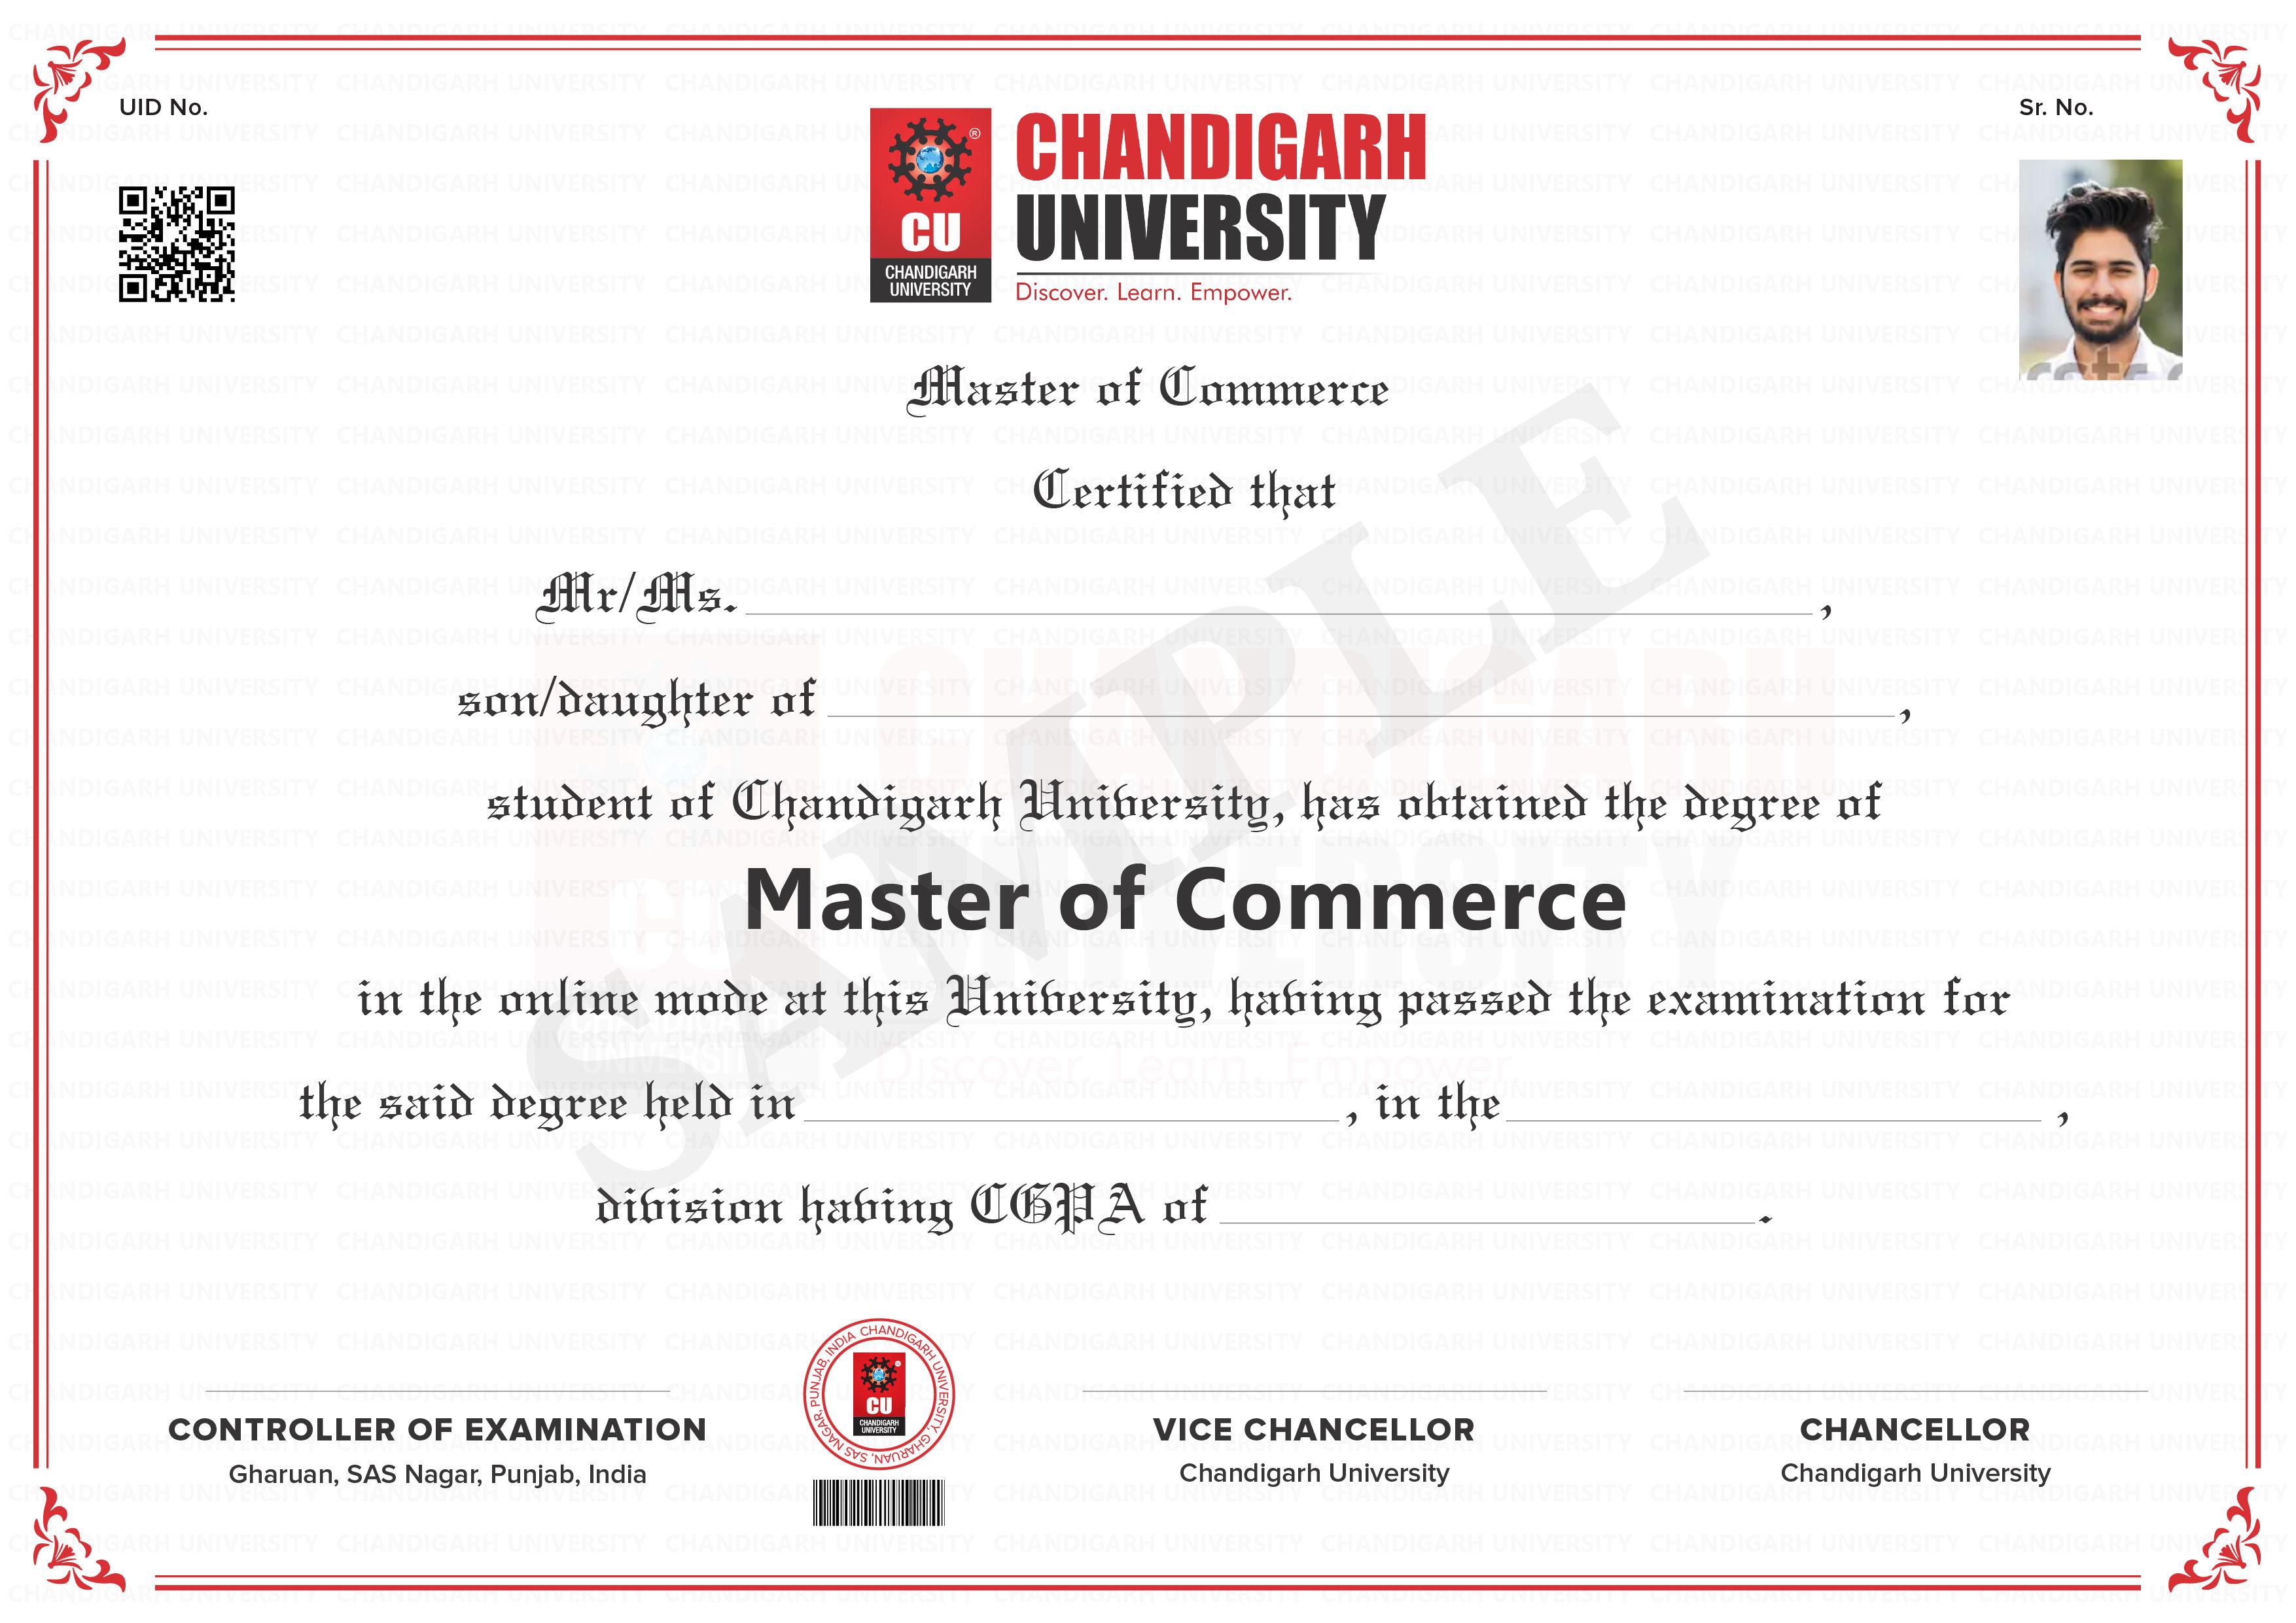 Master of Commerce